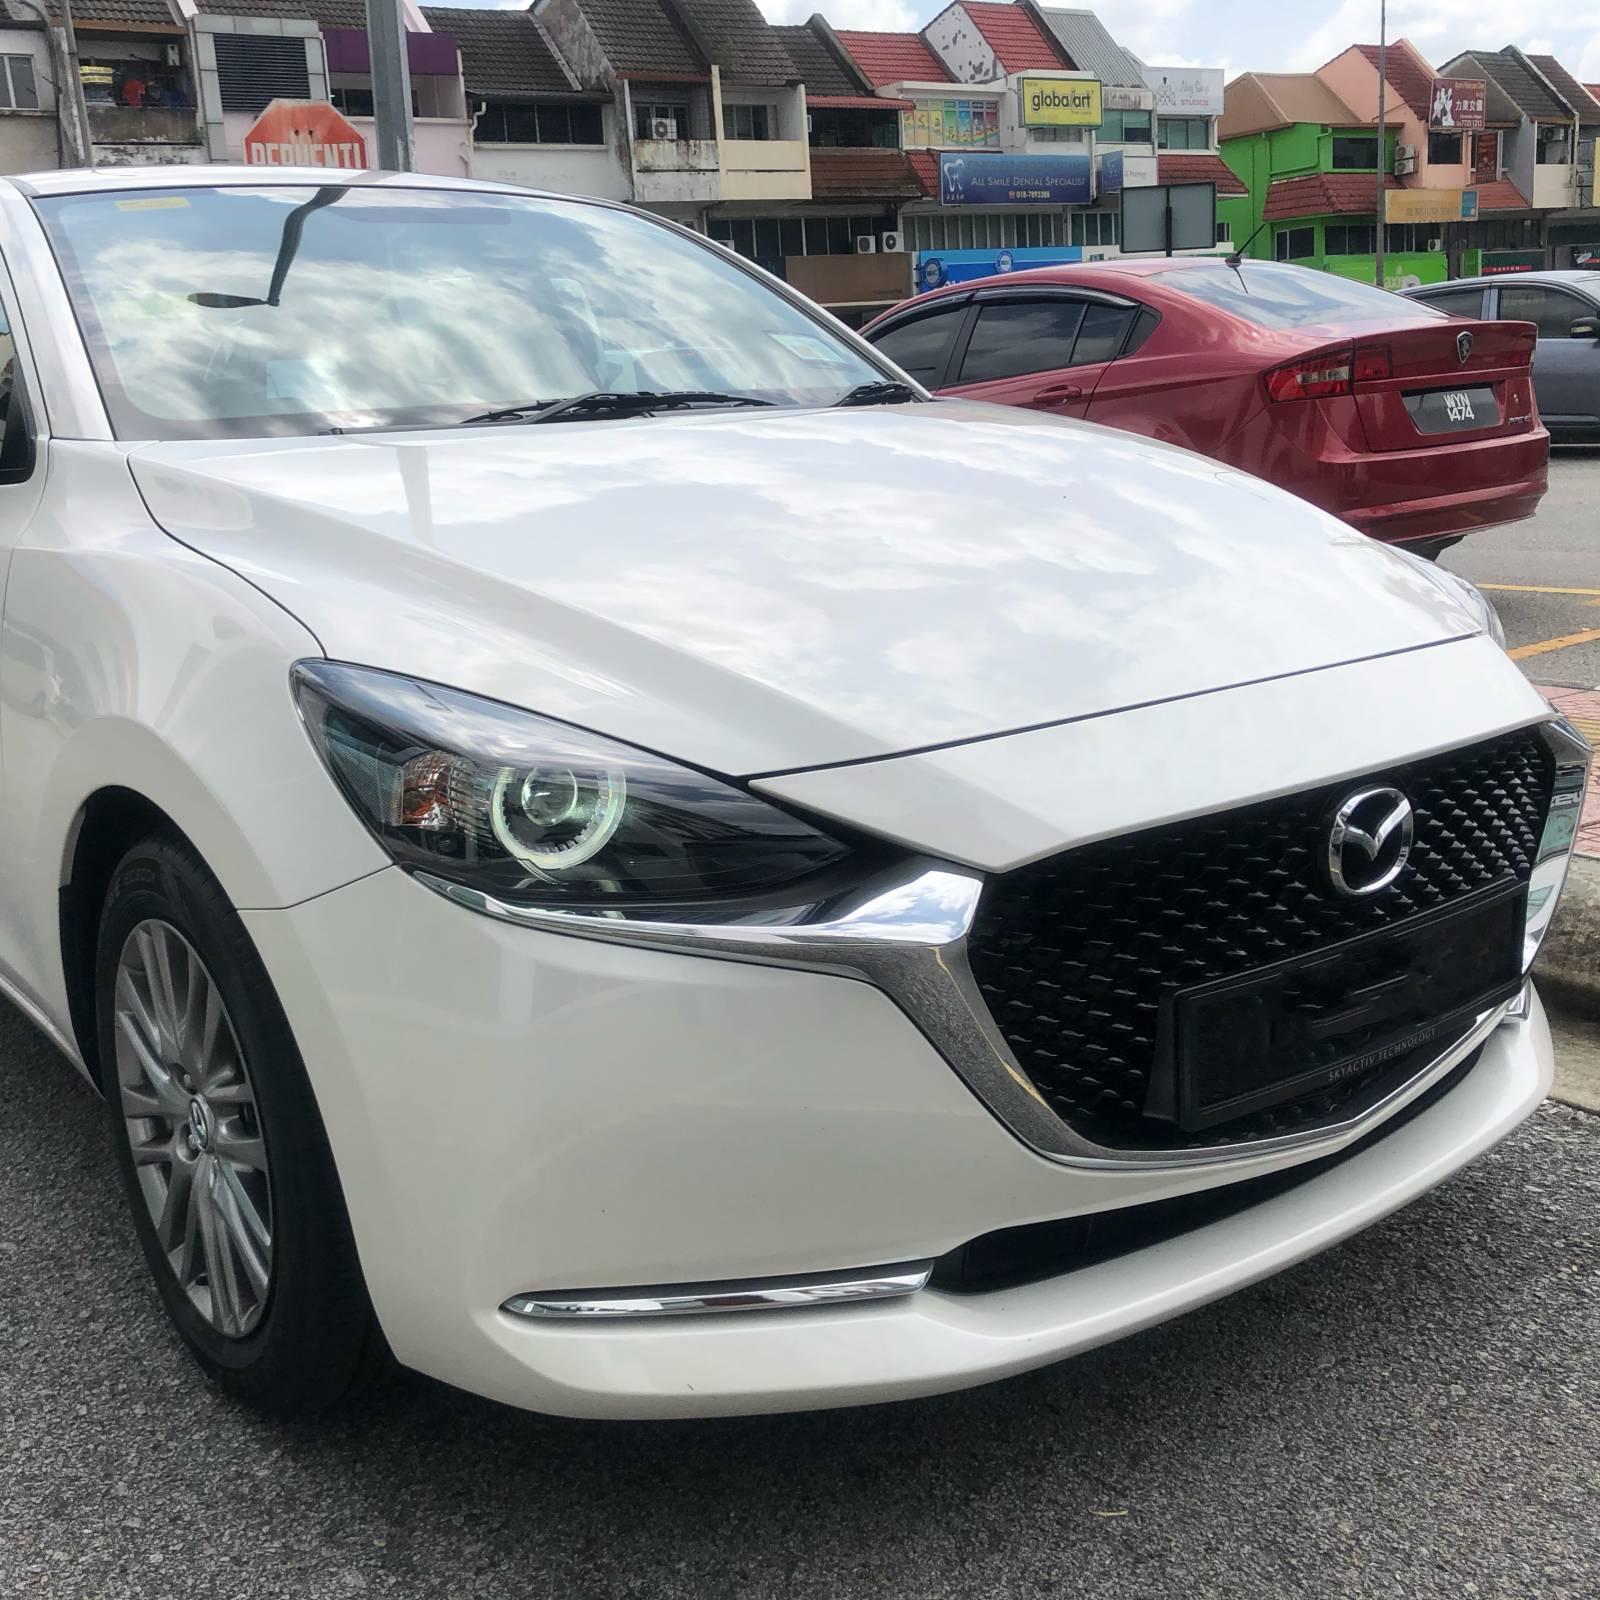 2020 Mazda 2 1.5 Hatchback